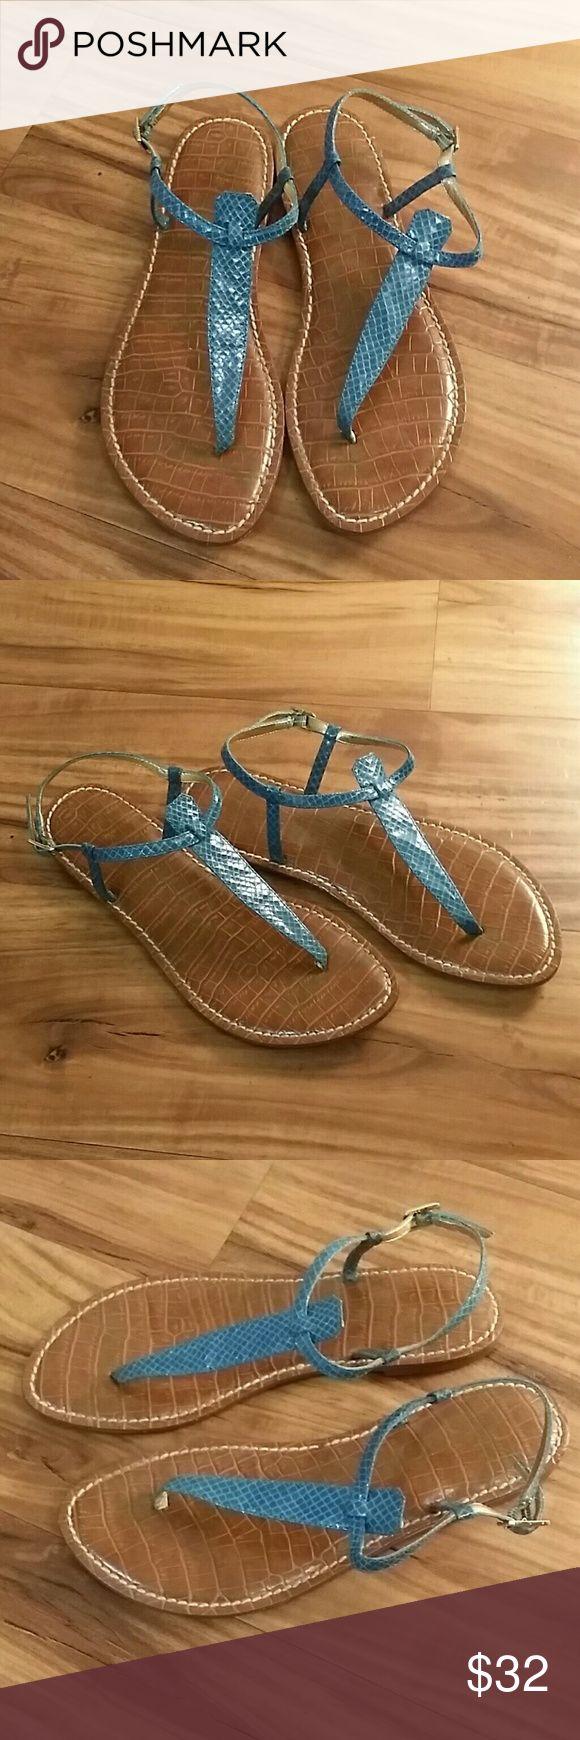 Sam Edelman Gigi thong sandals Excellent condition Sam Edelman sandals in a pretty greenish blue color. Size 7.5 Sam Edelman Shoes Sandals